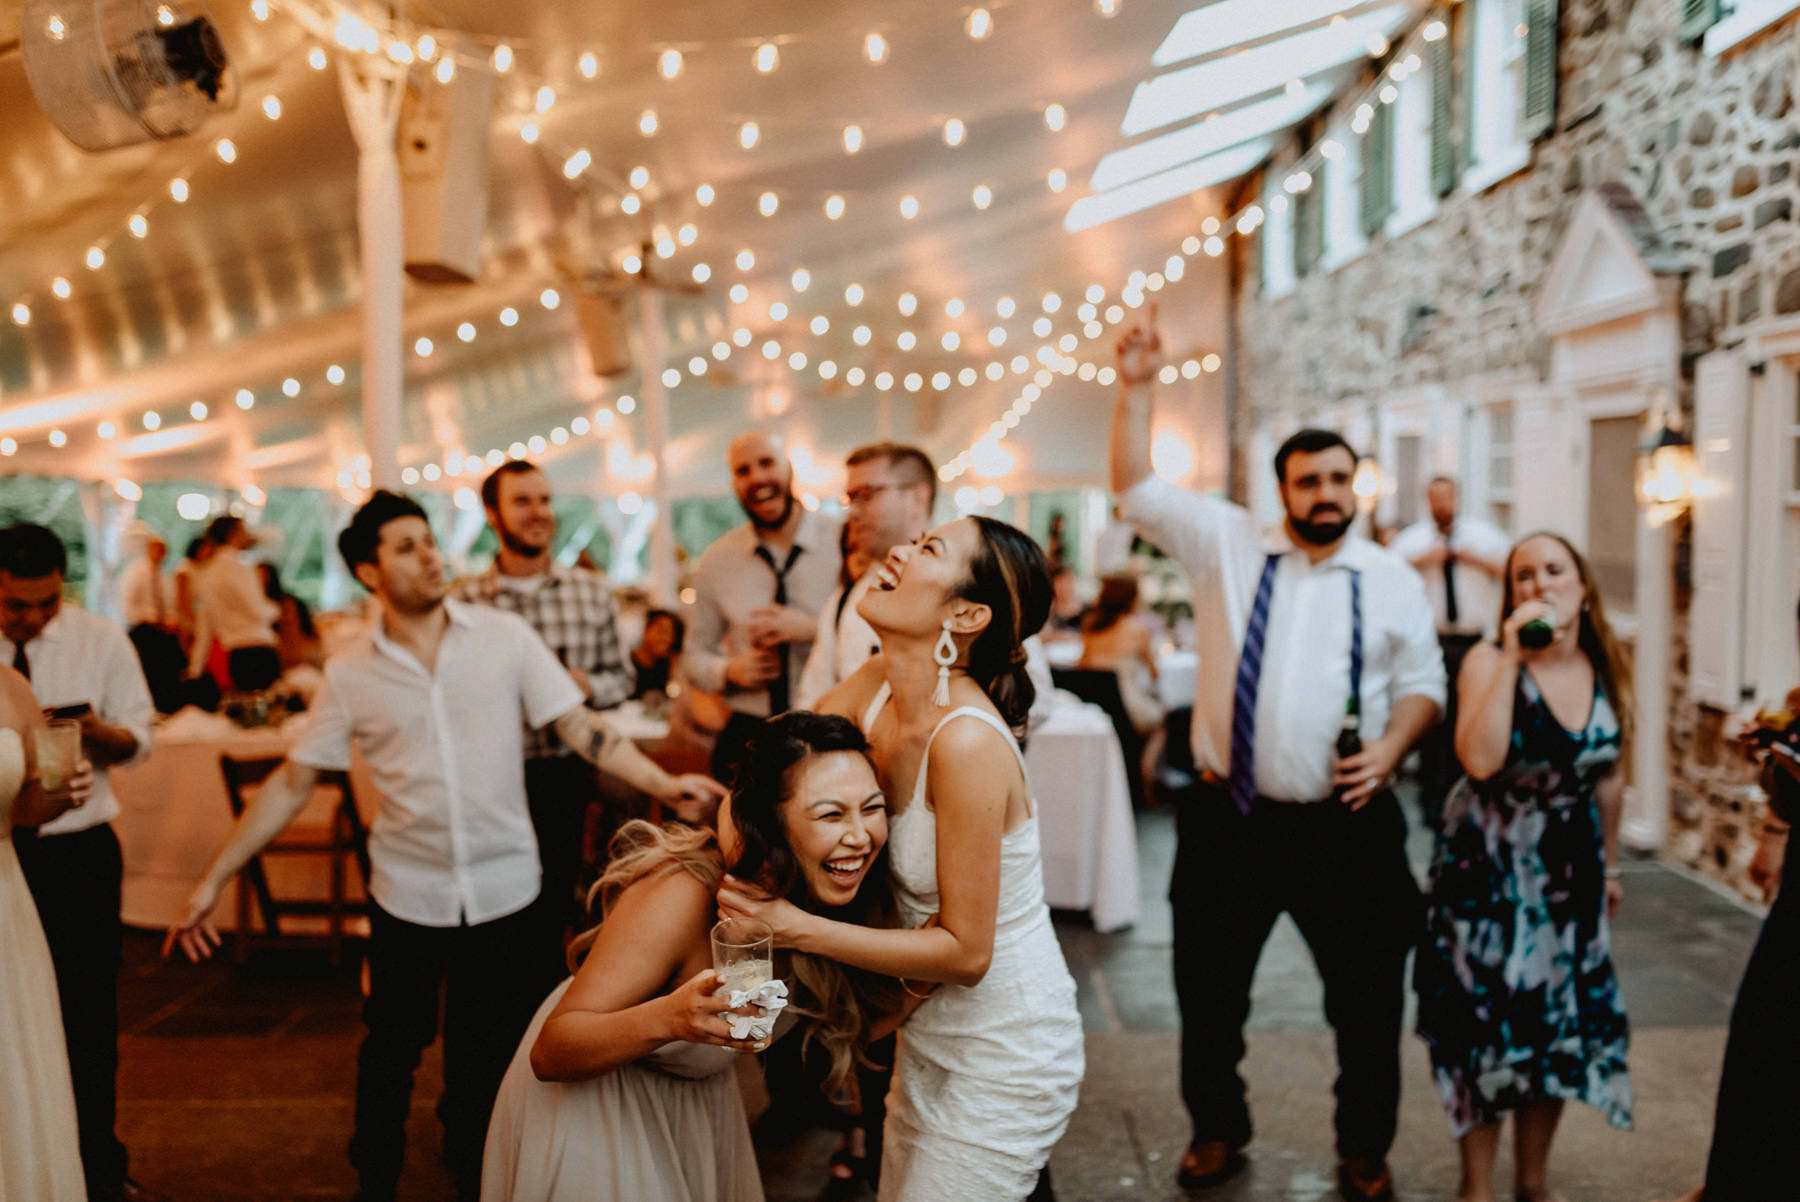 Appleford-estate-wedding-143.jpg